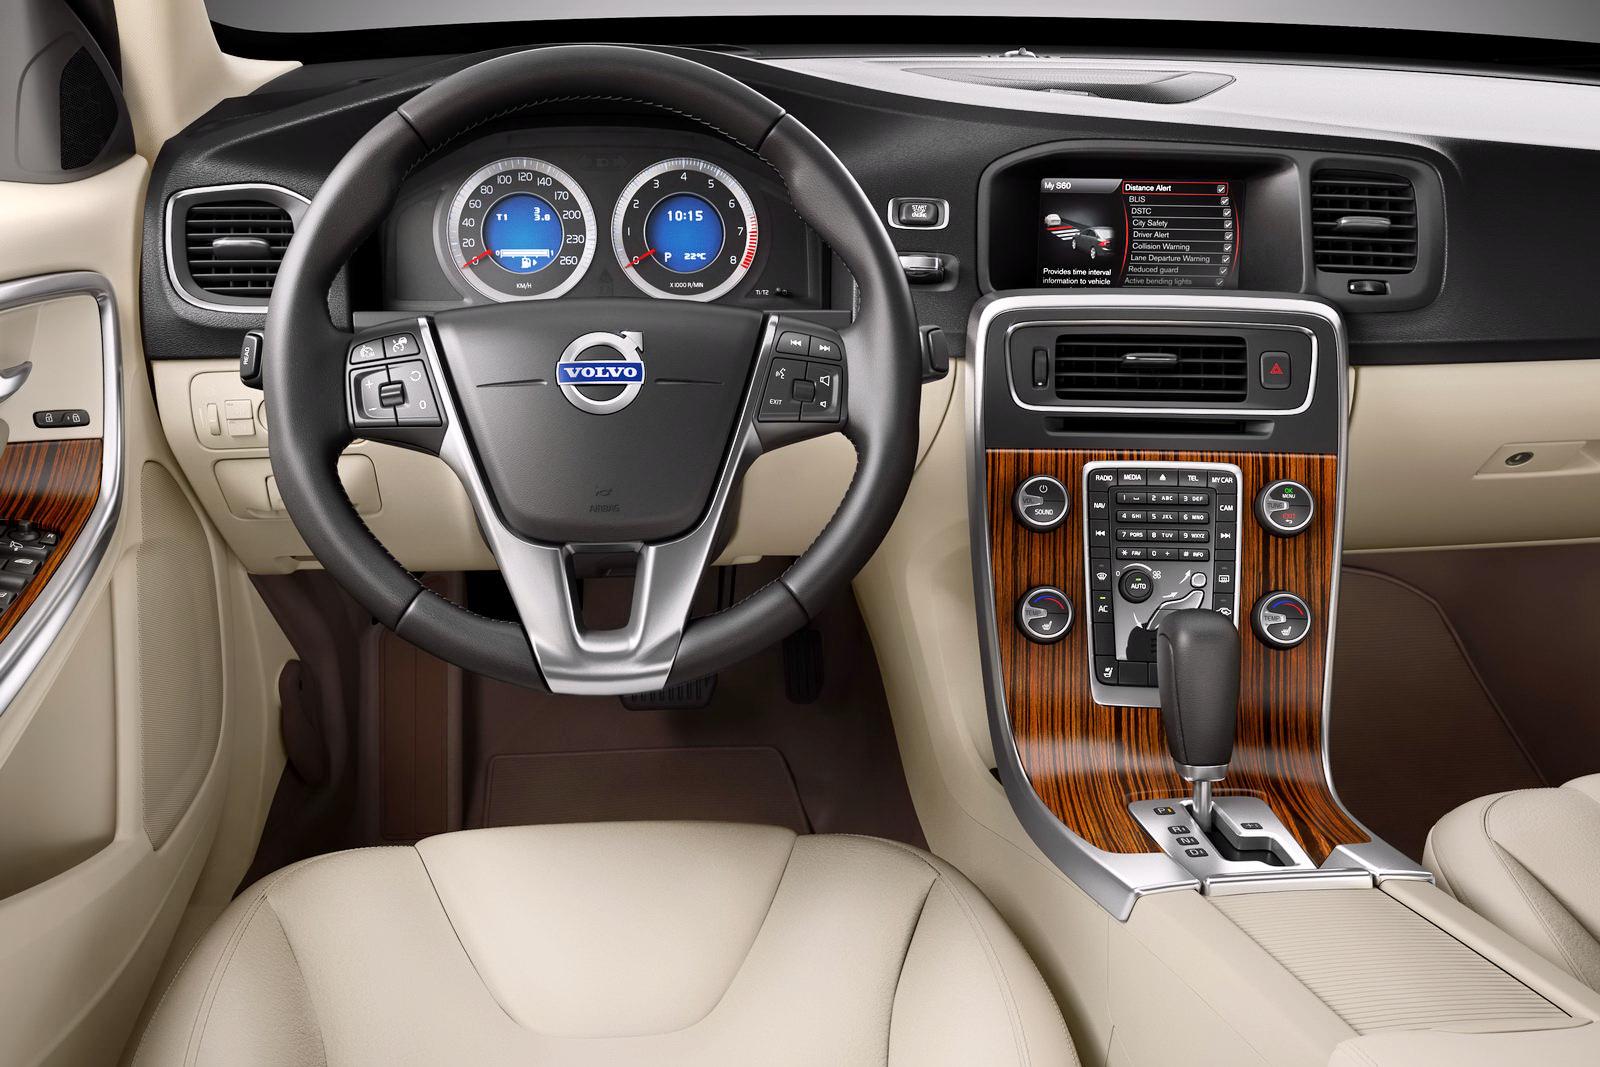 Volvo S60 2013 صور ومواصفات وأسعار فولفو S60 موديل 2013 ~ السيارات في مصر